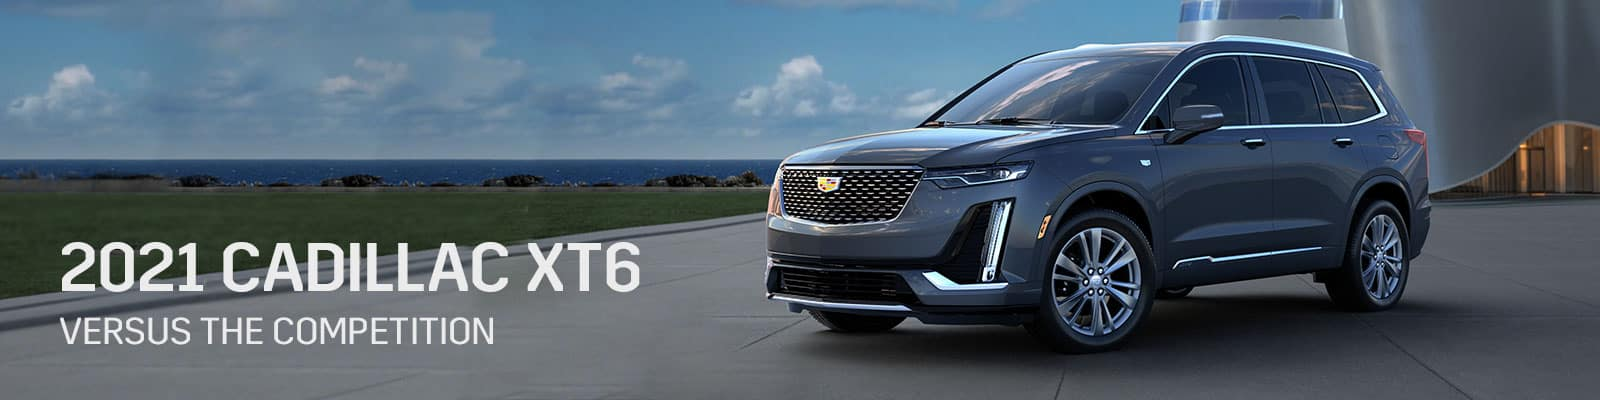 2021 Cadillac XT6 vs Competition - Germain Cadillac of Easton